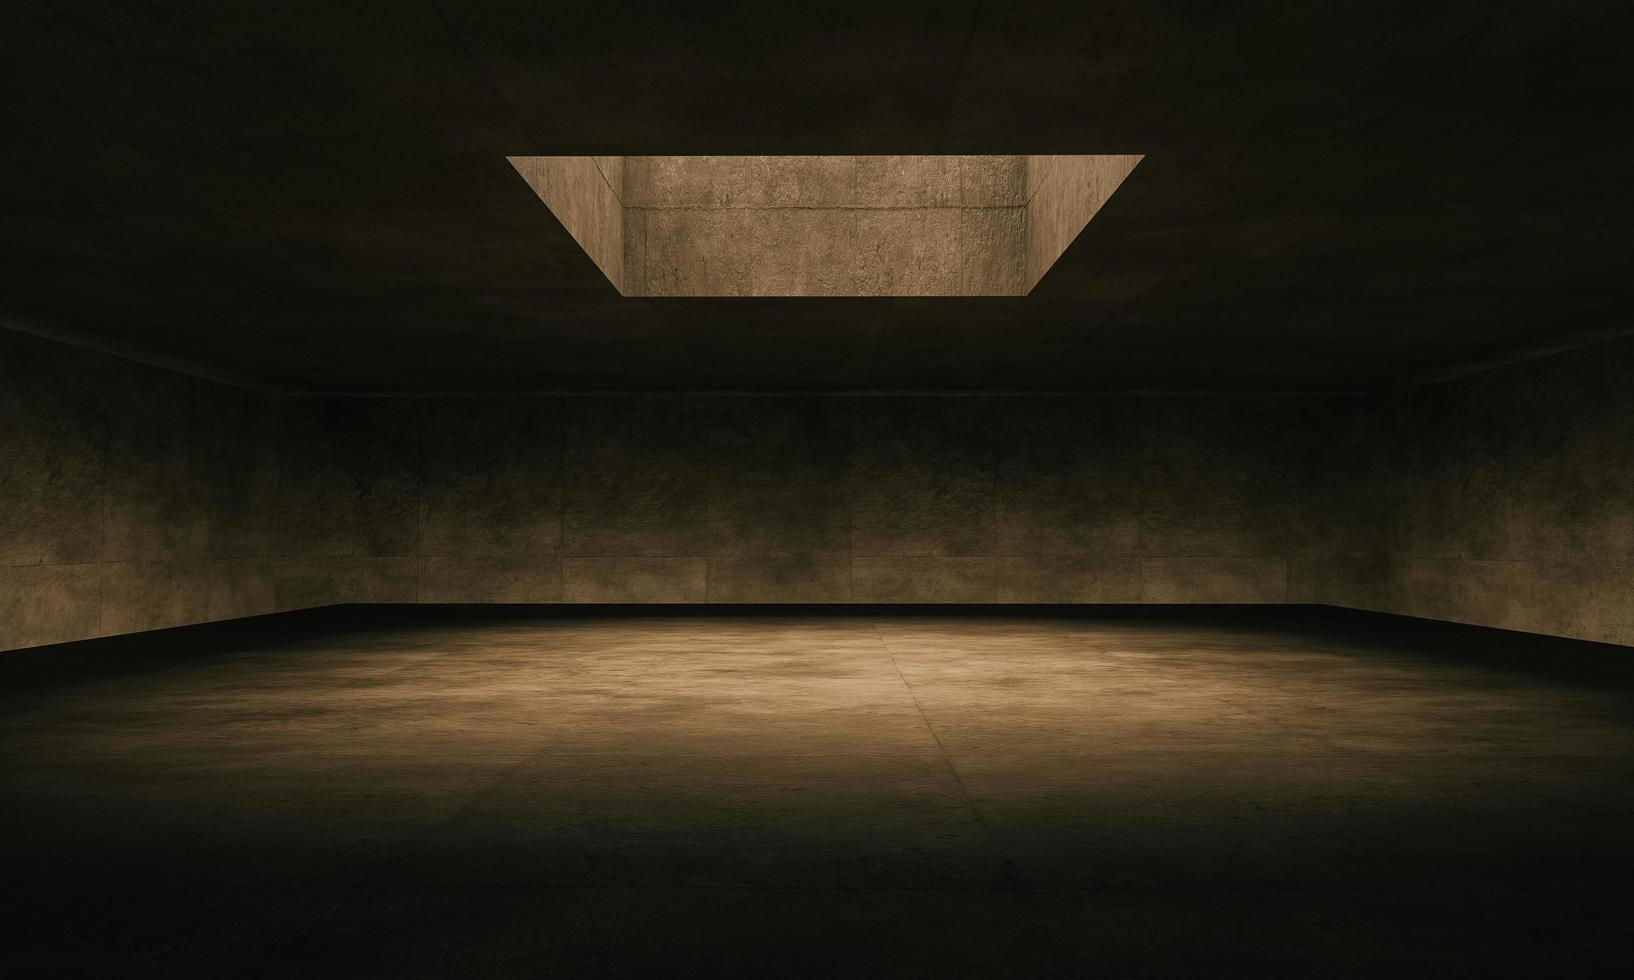 Gran sala de hormigón 3d iluminada por una ventana superior foto